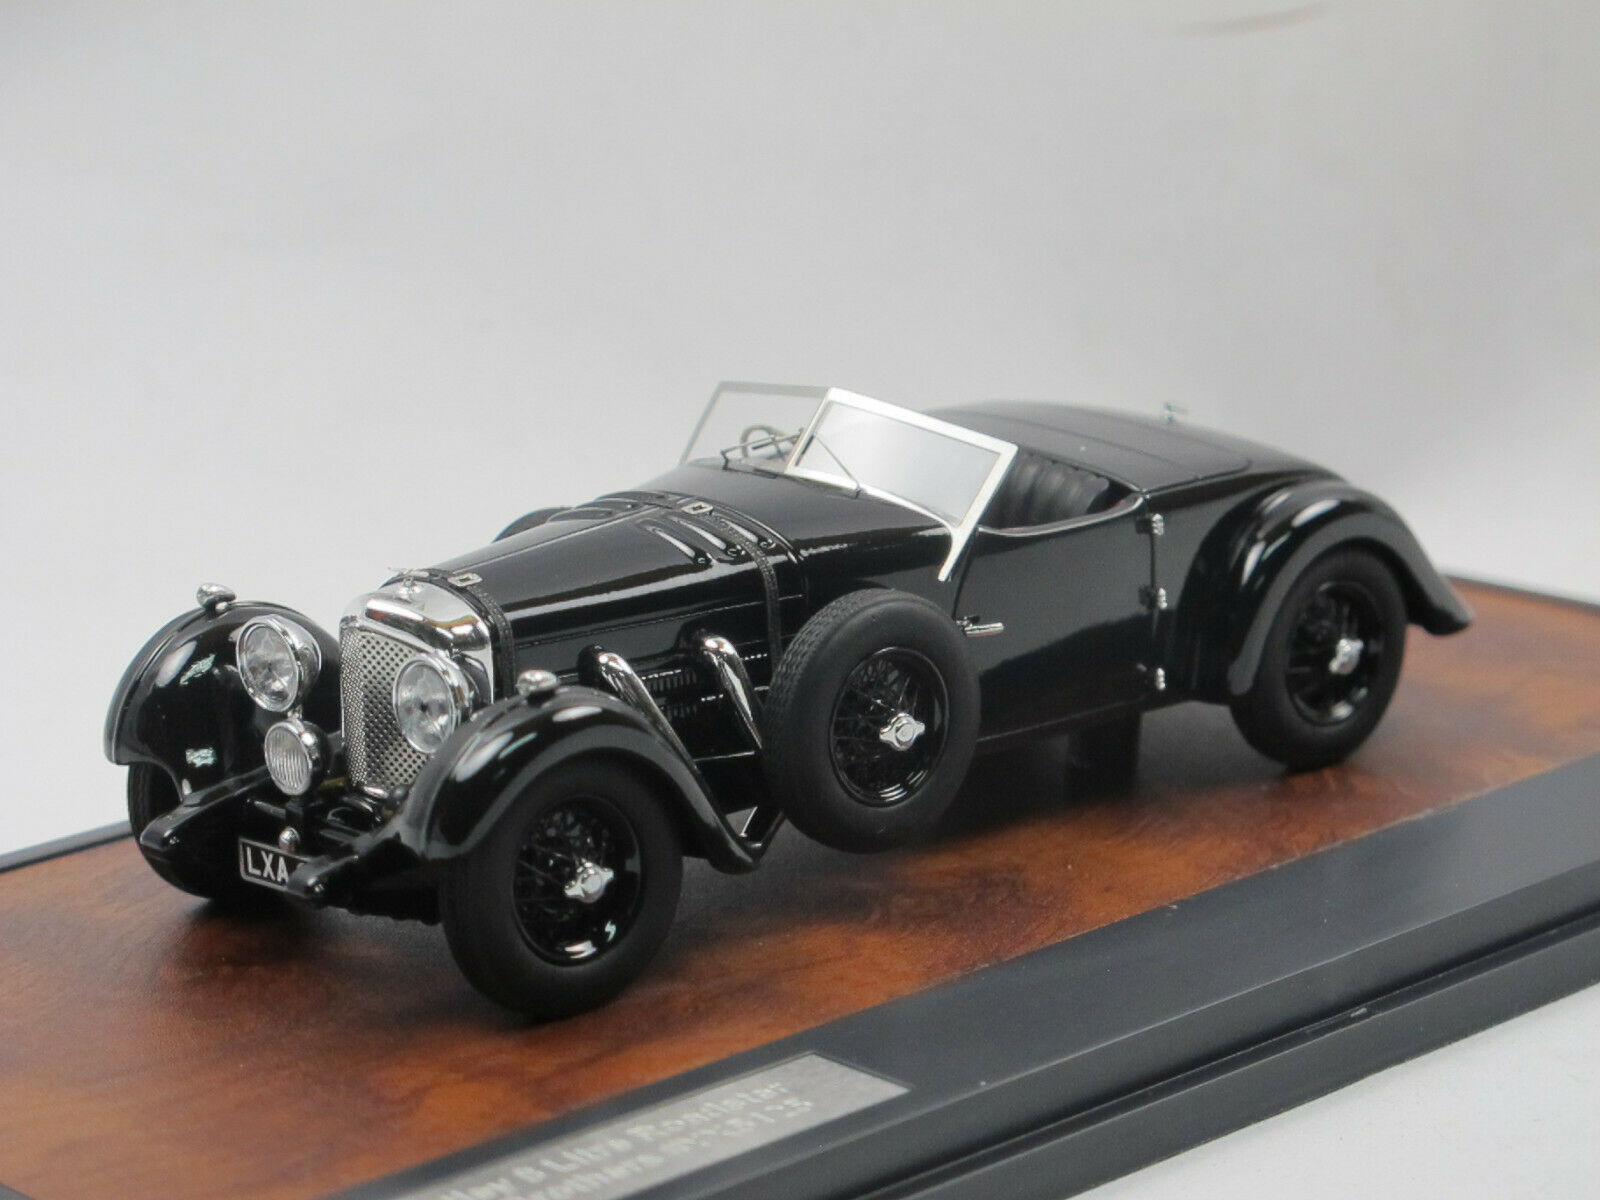 grandes precios de descuento Matrix scale models models models Bentley 1932 8 litre dottridge Brojohers roadster Open 1 43  buena reputación